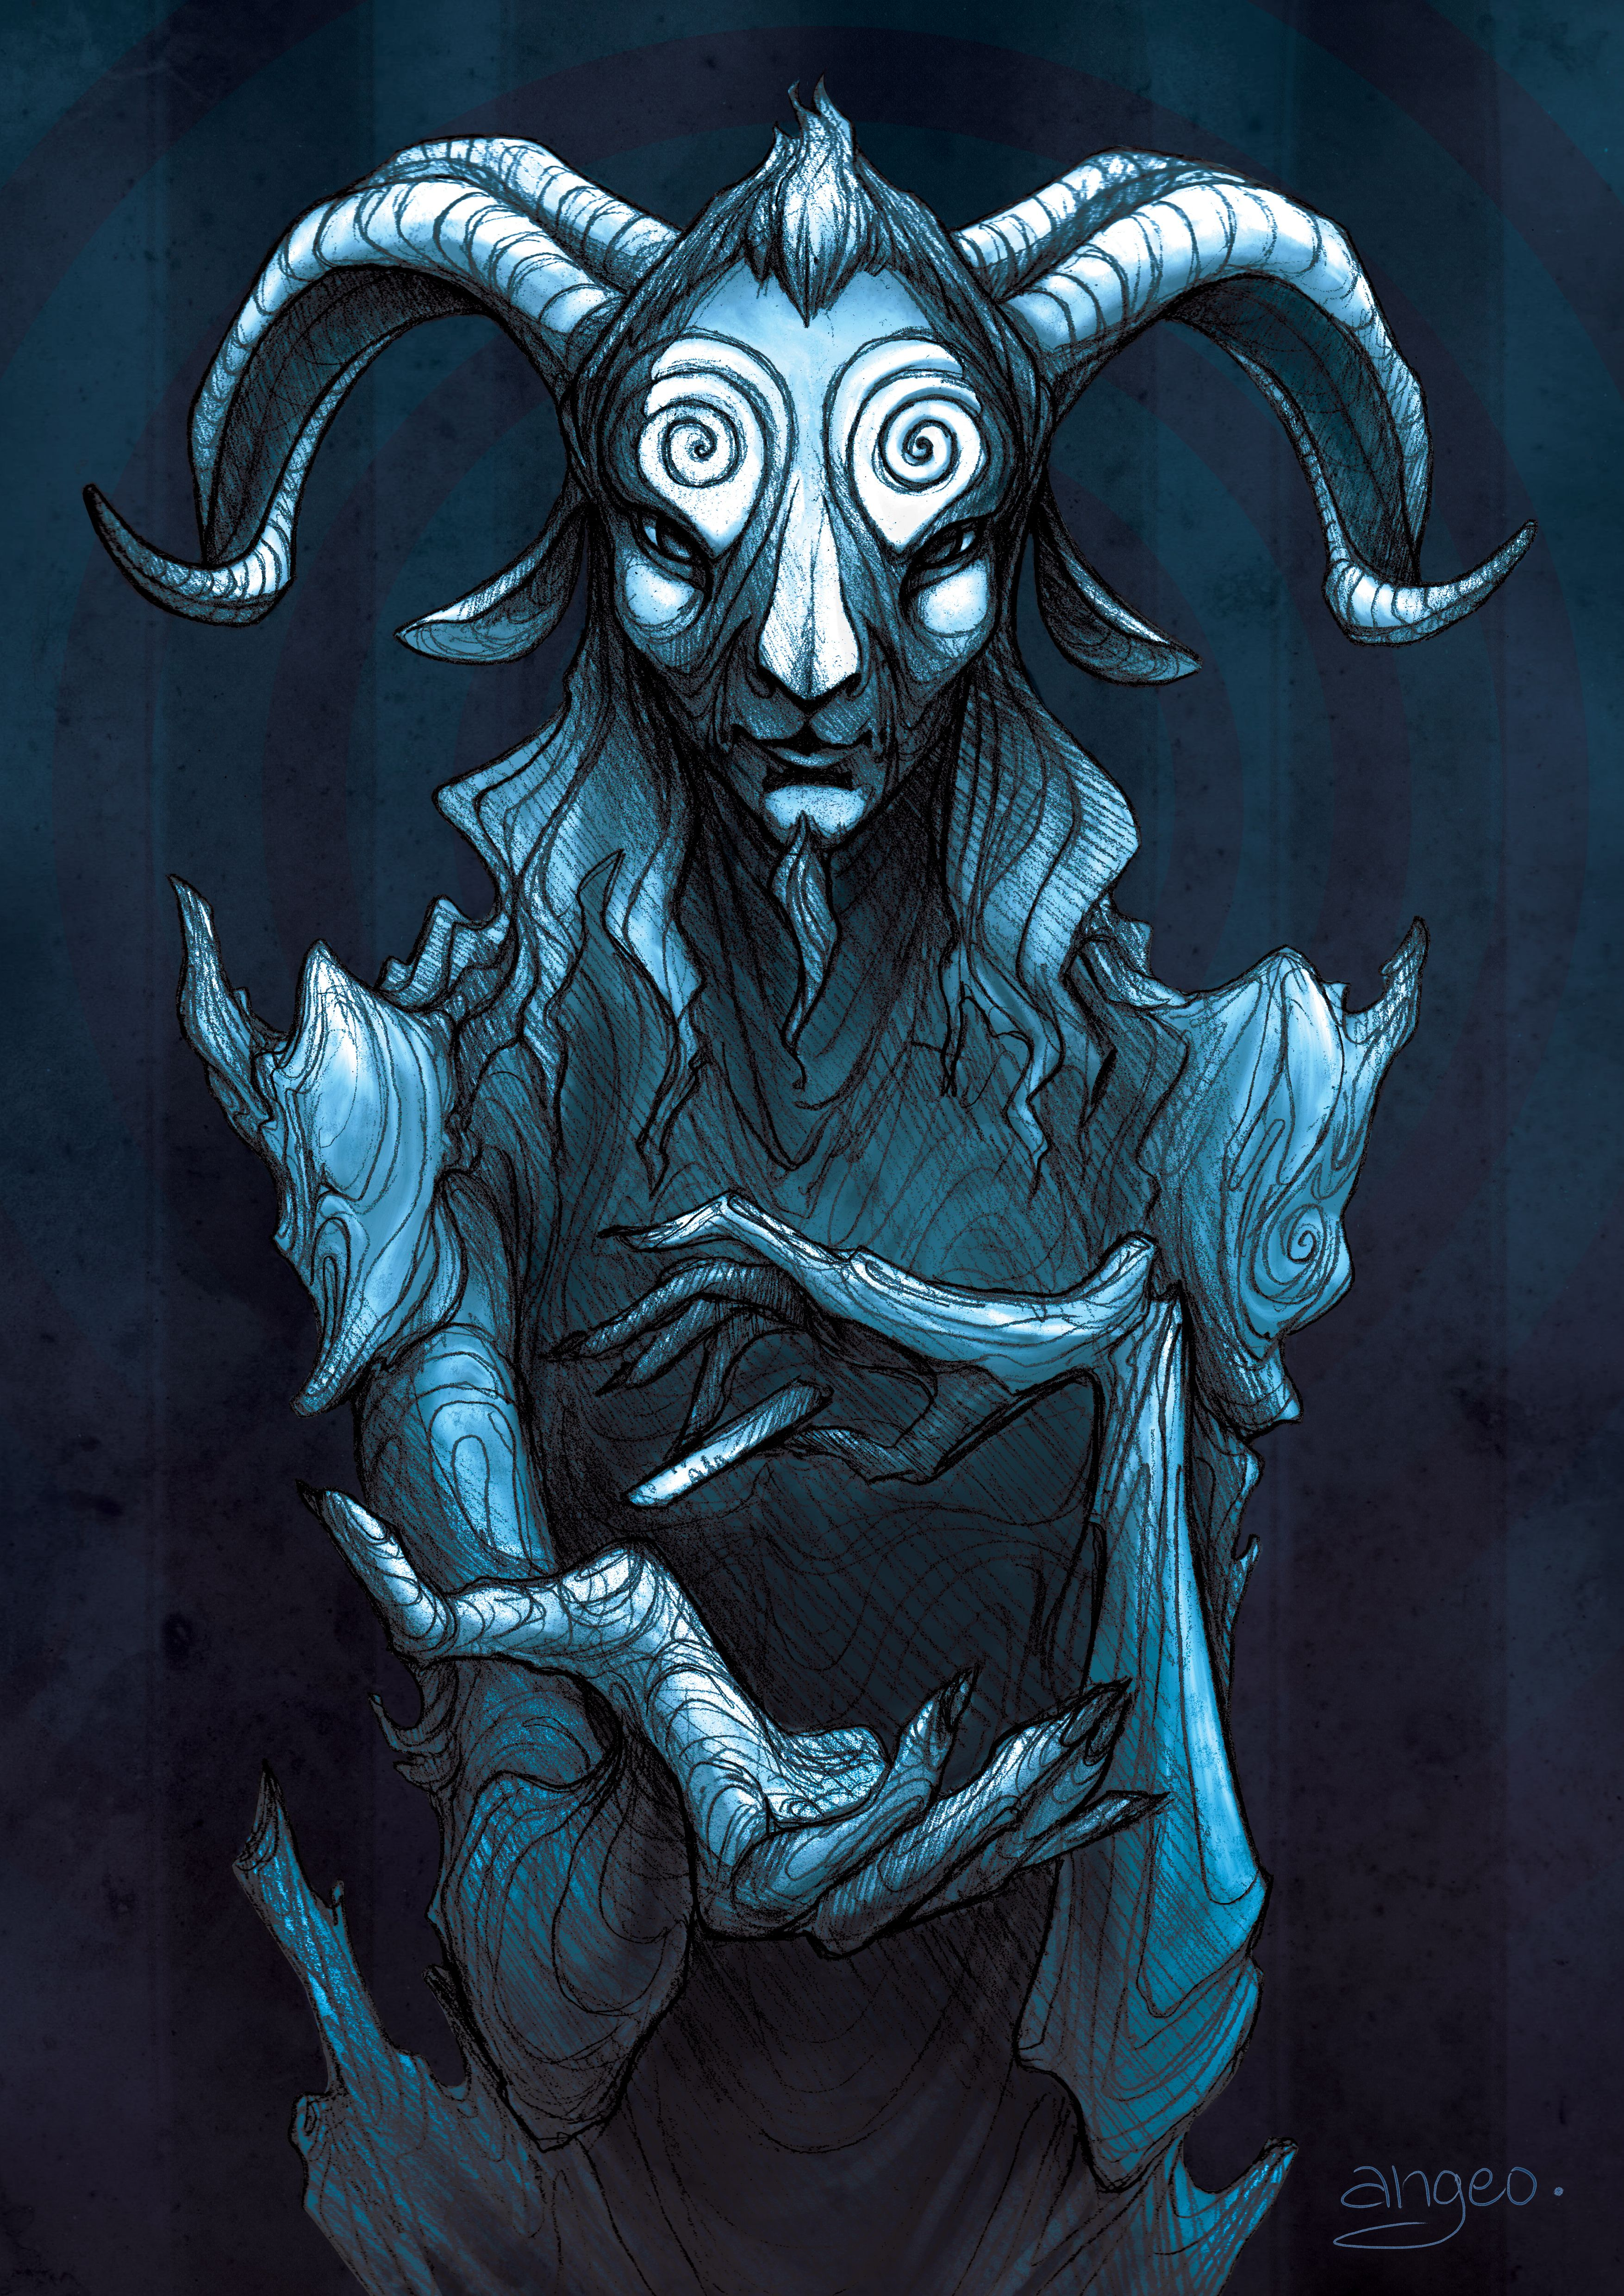 Pans labyrinth angeoart panslabyrinth faun fairytale dark fanart creature fantasy digitalart drawing art pencil sketch